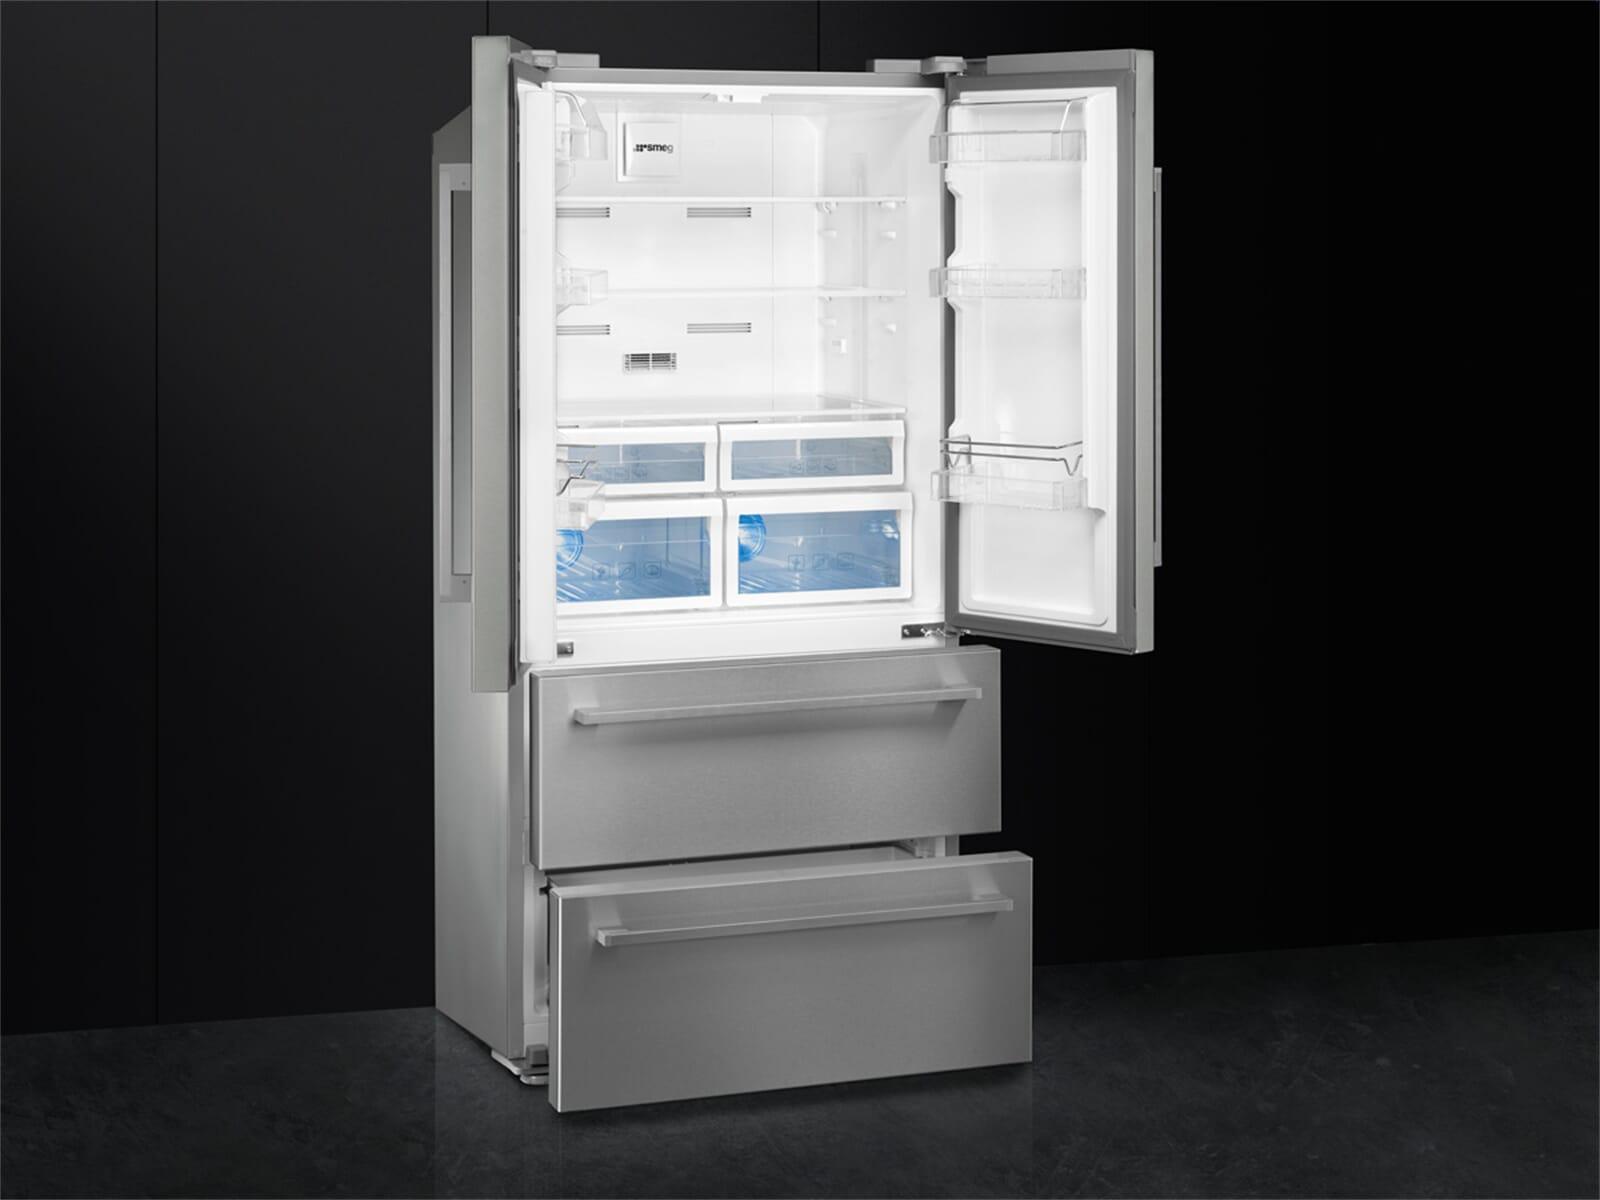 Smeg Kühlschrank French Door : Smeg fq fx pe frenchdoor kühl gefrier kombination edelstahl